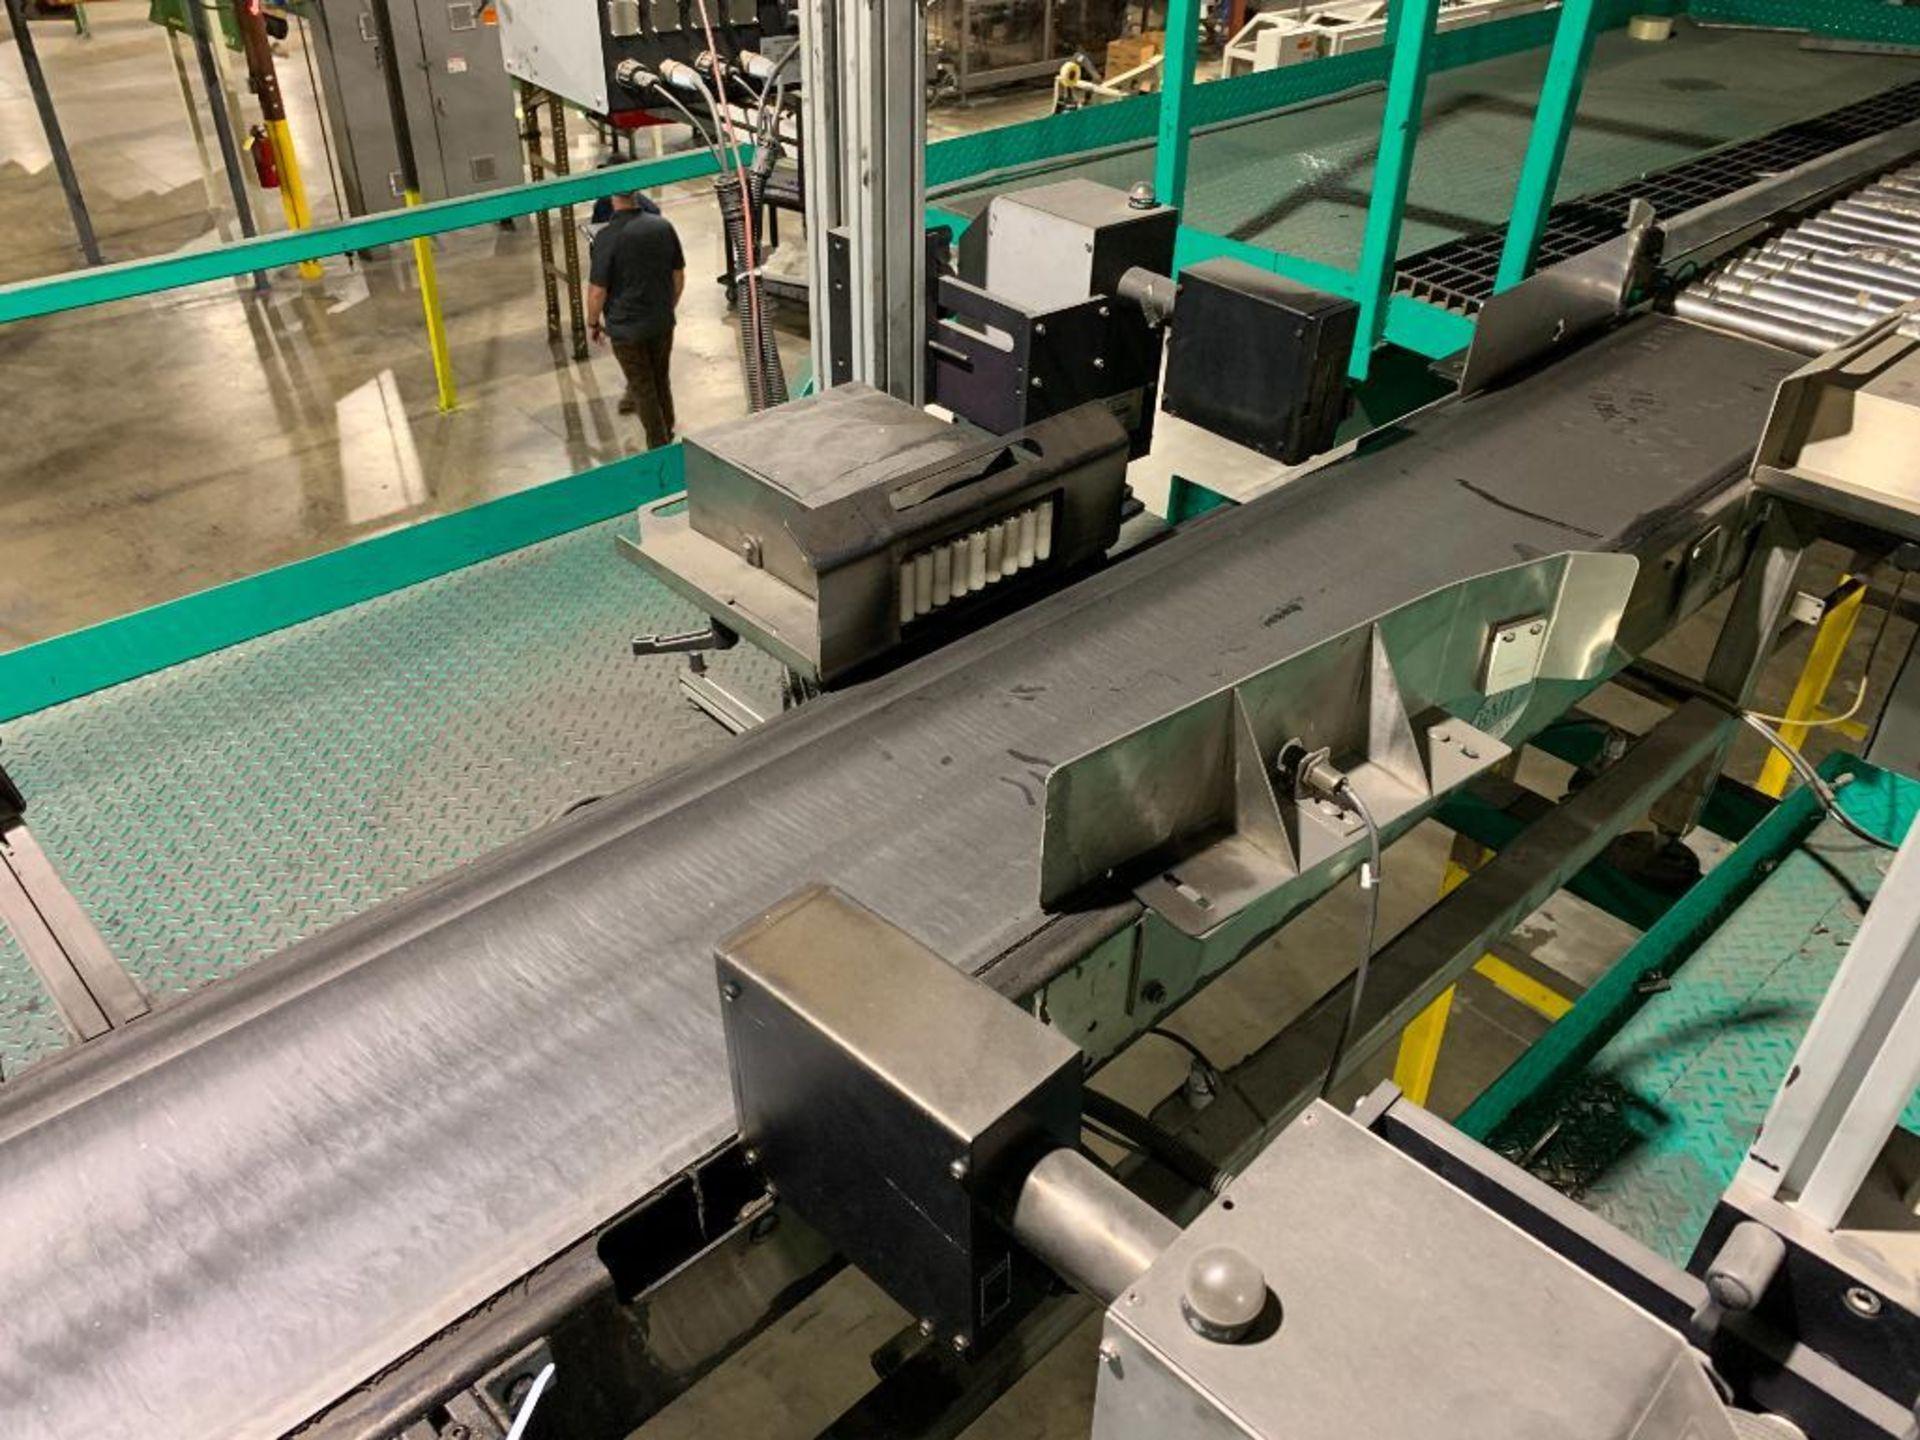 BMI stainless steel conveyor - Image 2 of 14